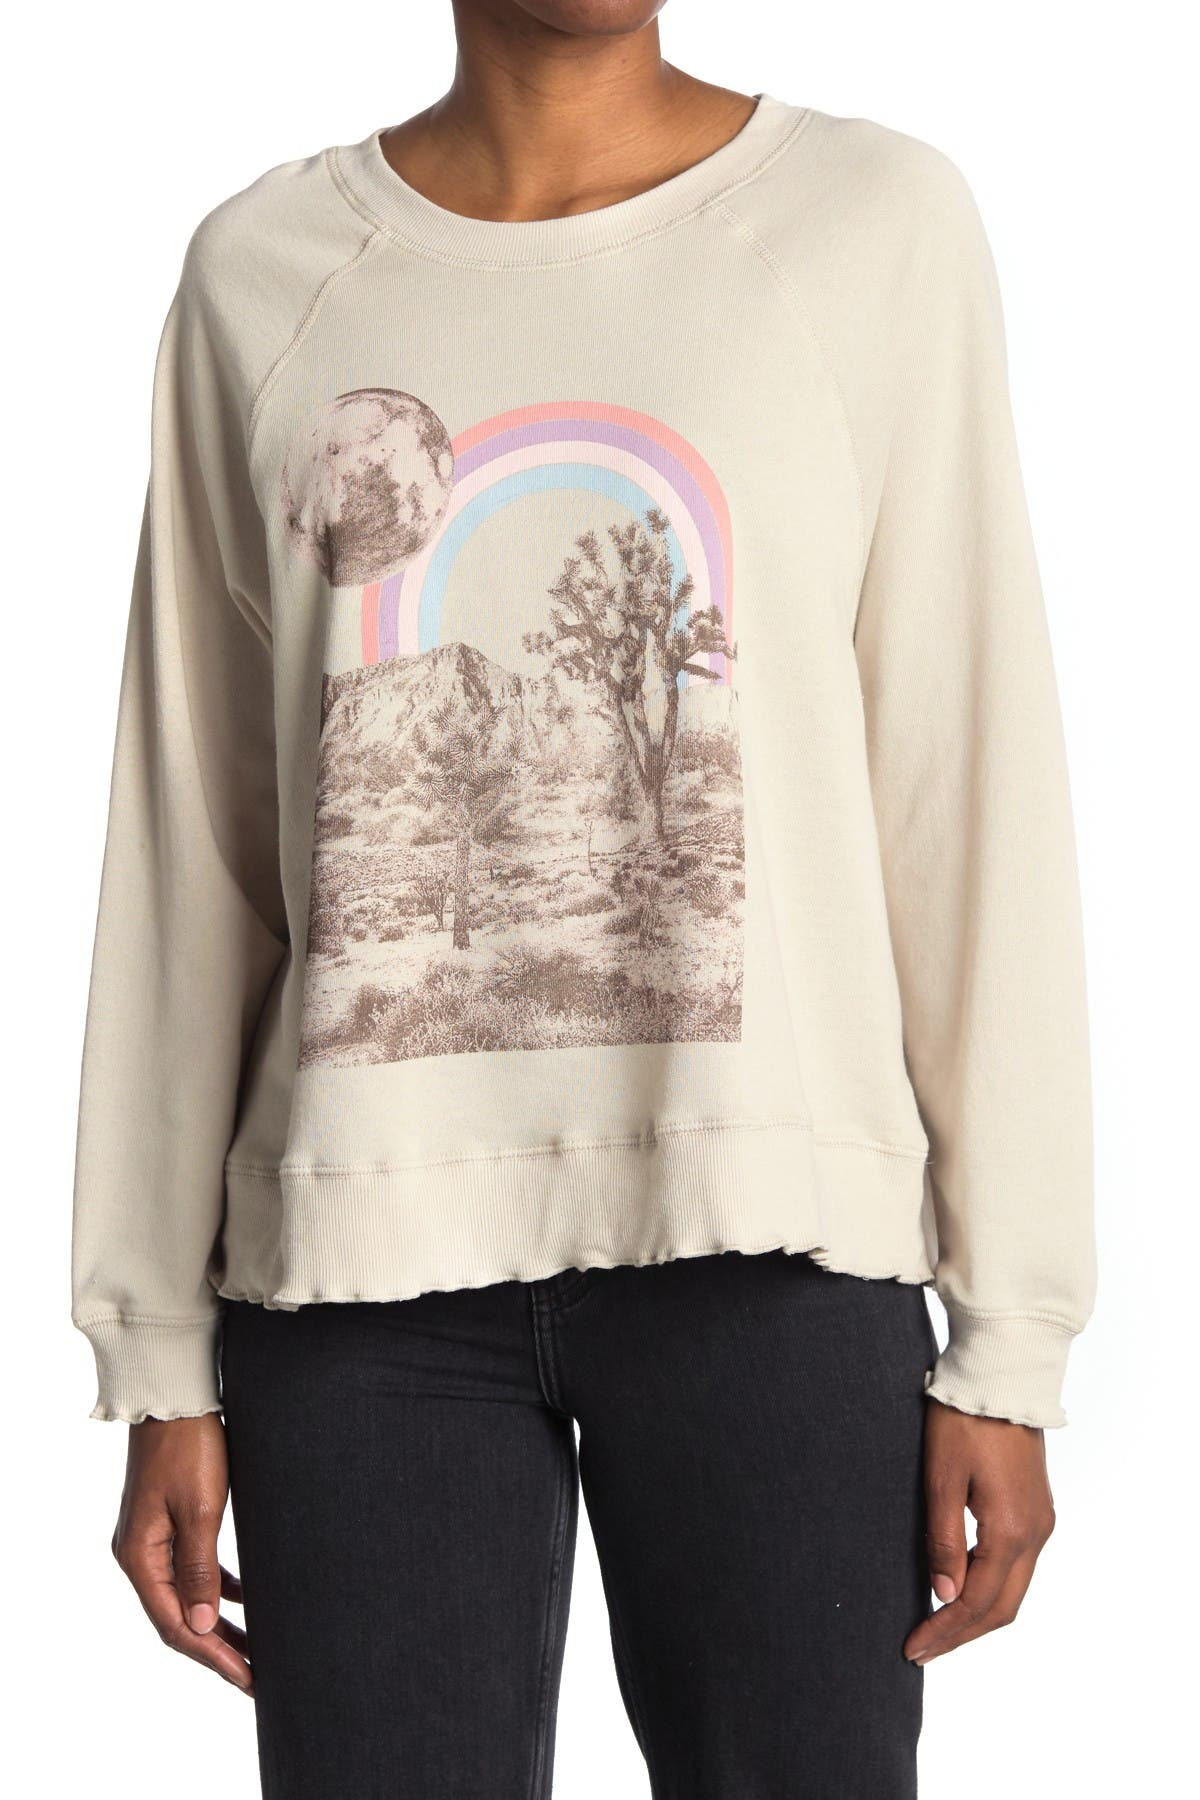 Image of LA LA LAND CREATIVE CO Rainbow Joshua Tree Raglan Pullover